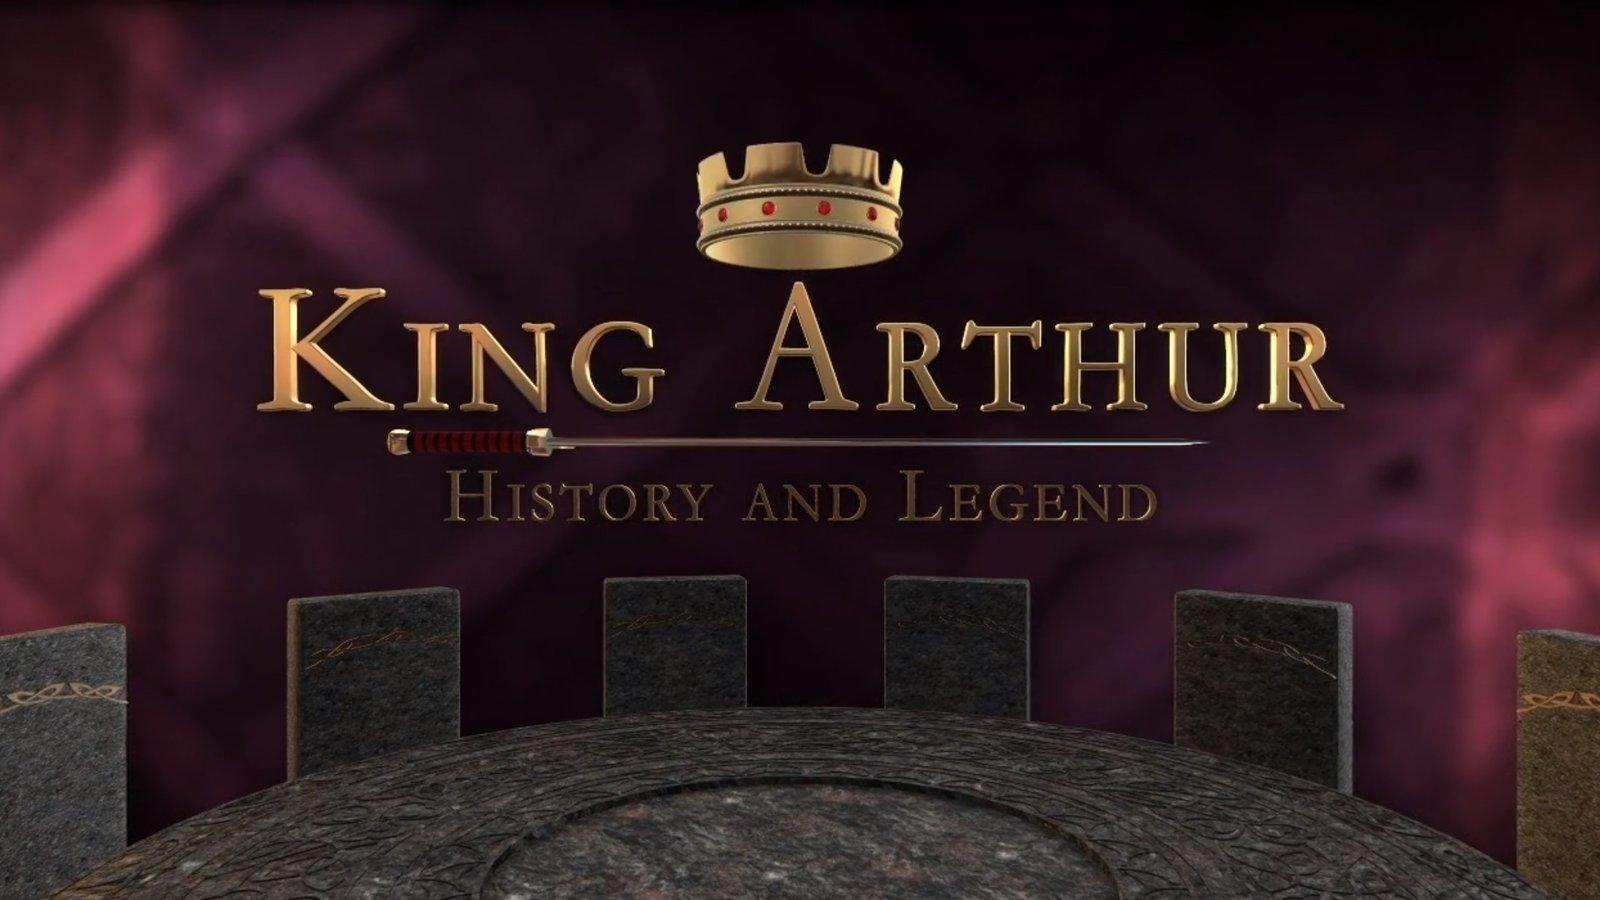 The Origins of King Arthur